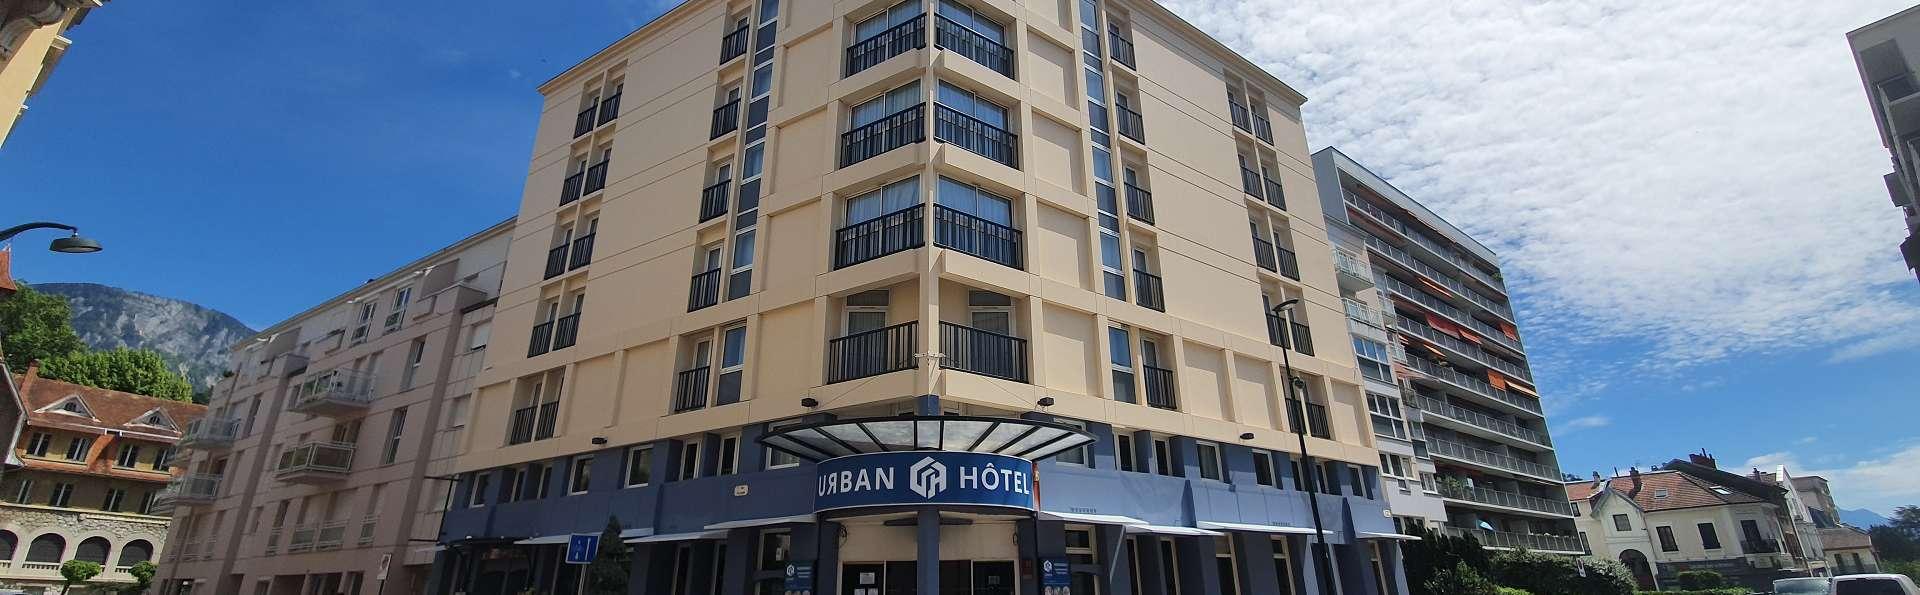 Urban Hôtel  - facade_urban.jpg